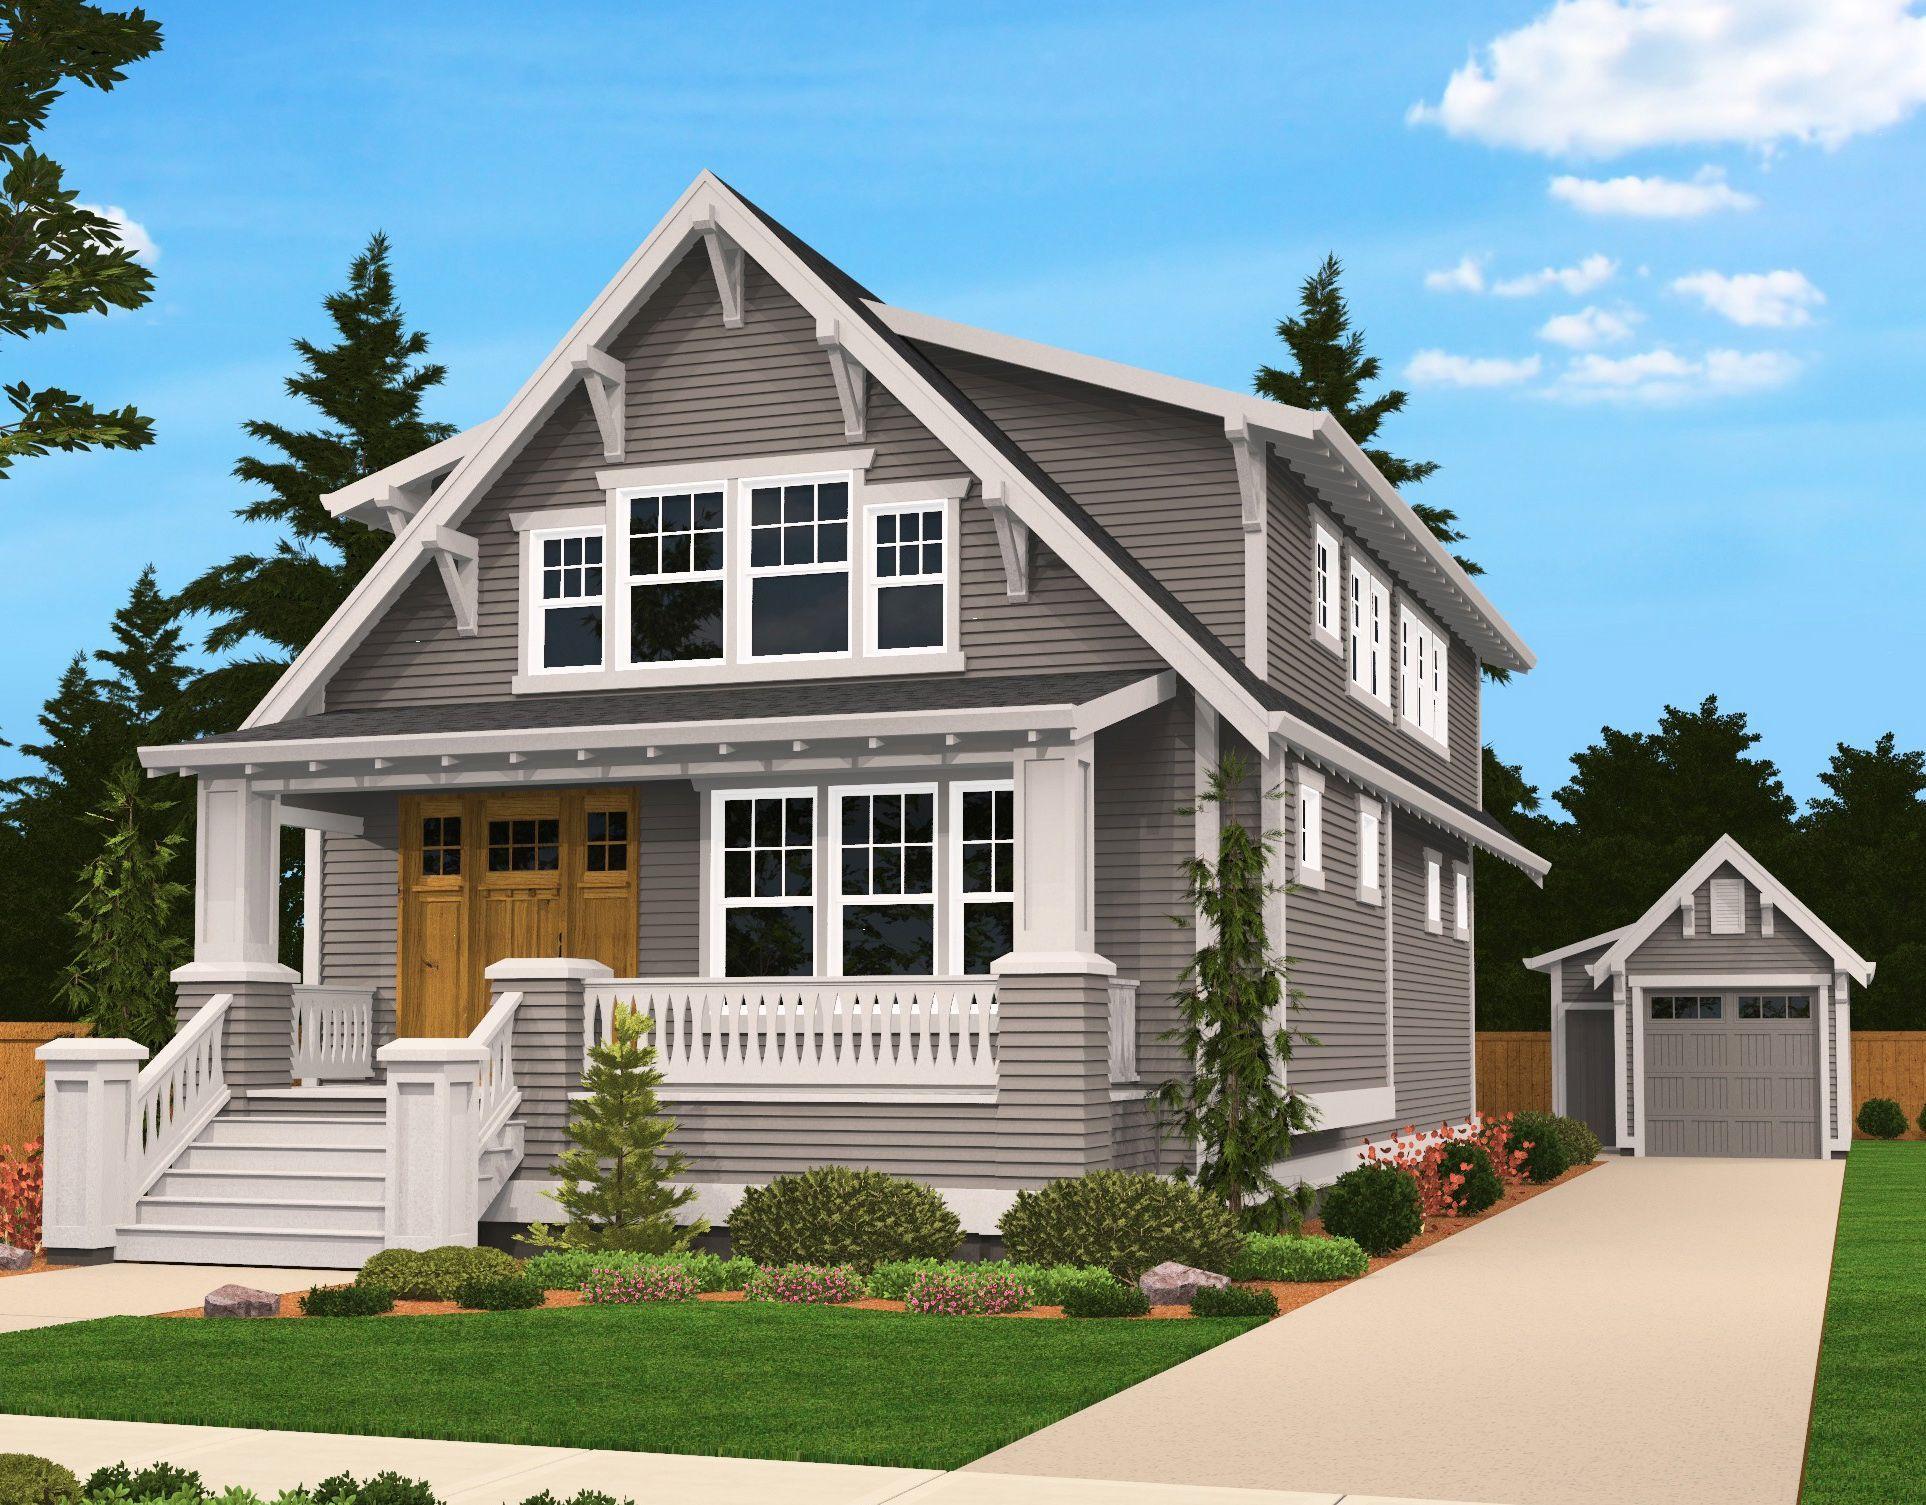 10 Bungalow House Plans To Impress Craftsman House Plans Cottage House Plans Craftsman House